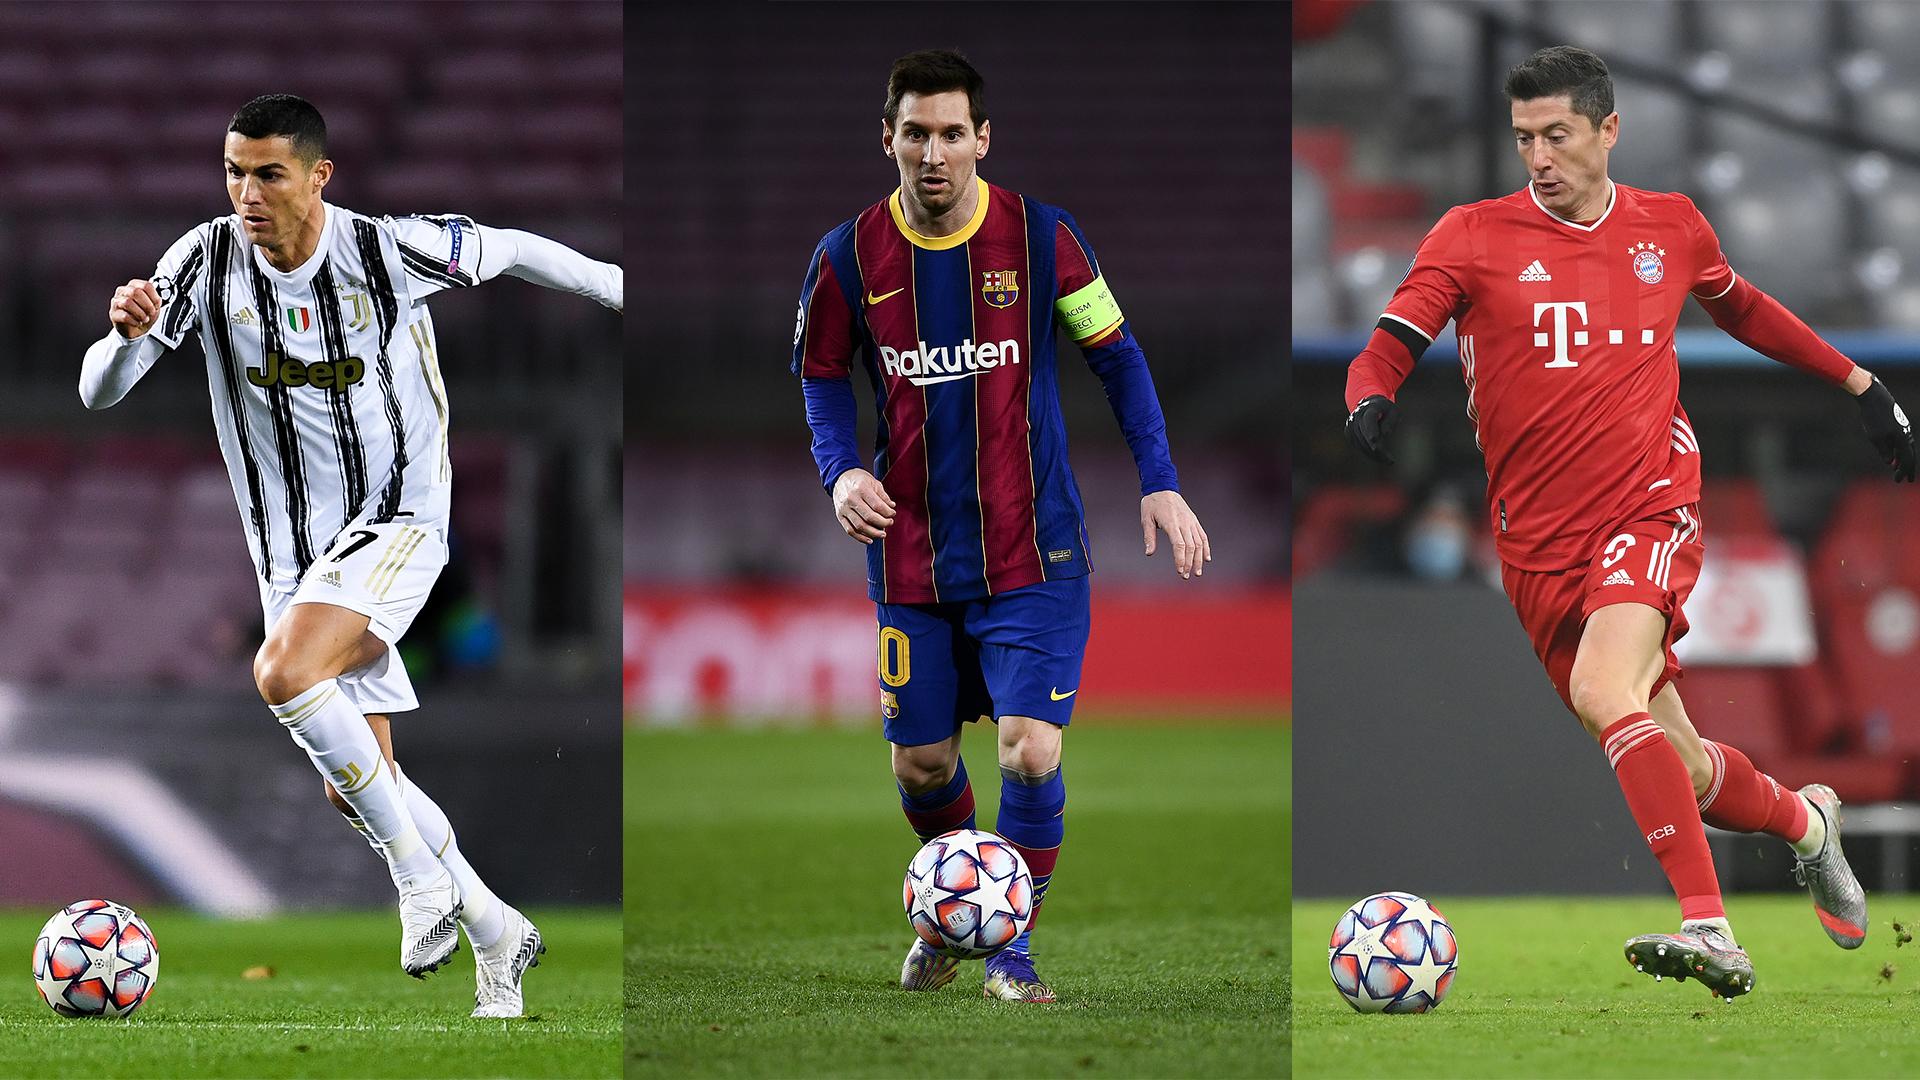 Messi, Ronaldo, Lewandowski nominated for FIFA's best men's player